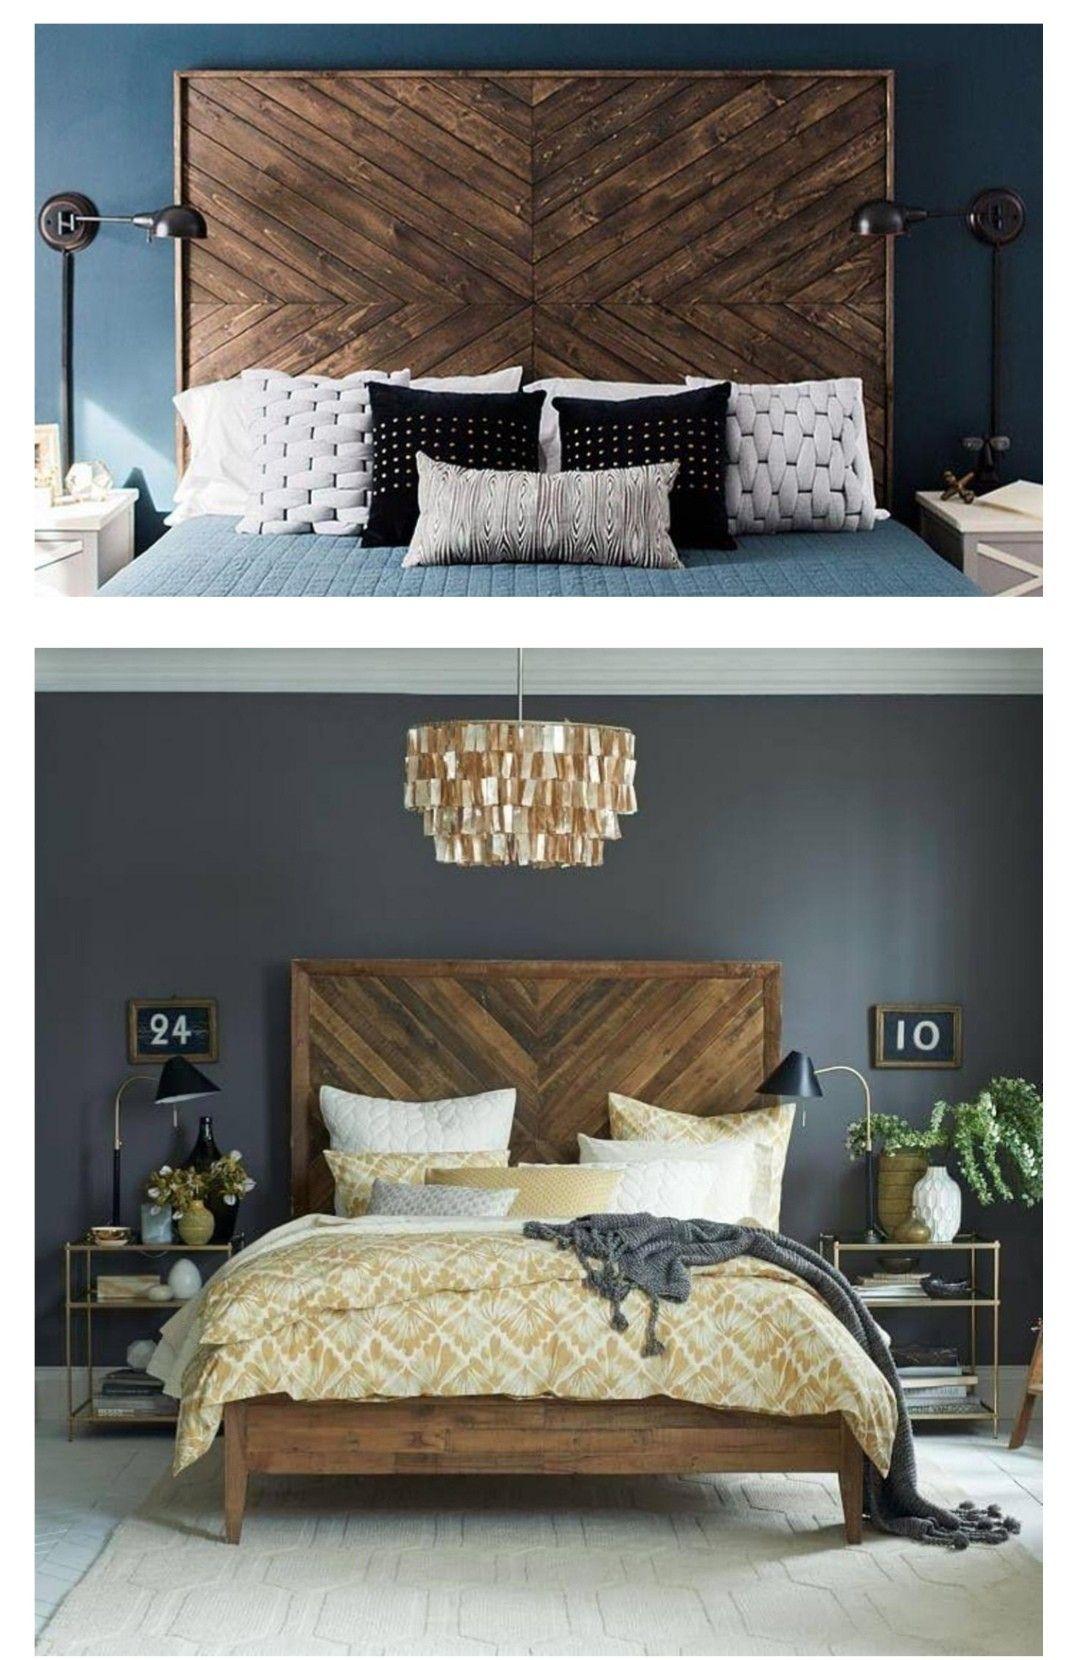 Wooden headboard Rattan headboard, Home decor, Decor